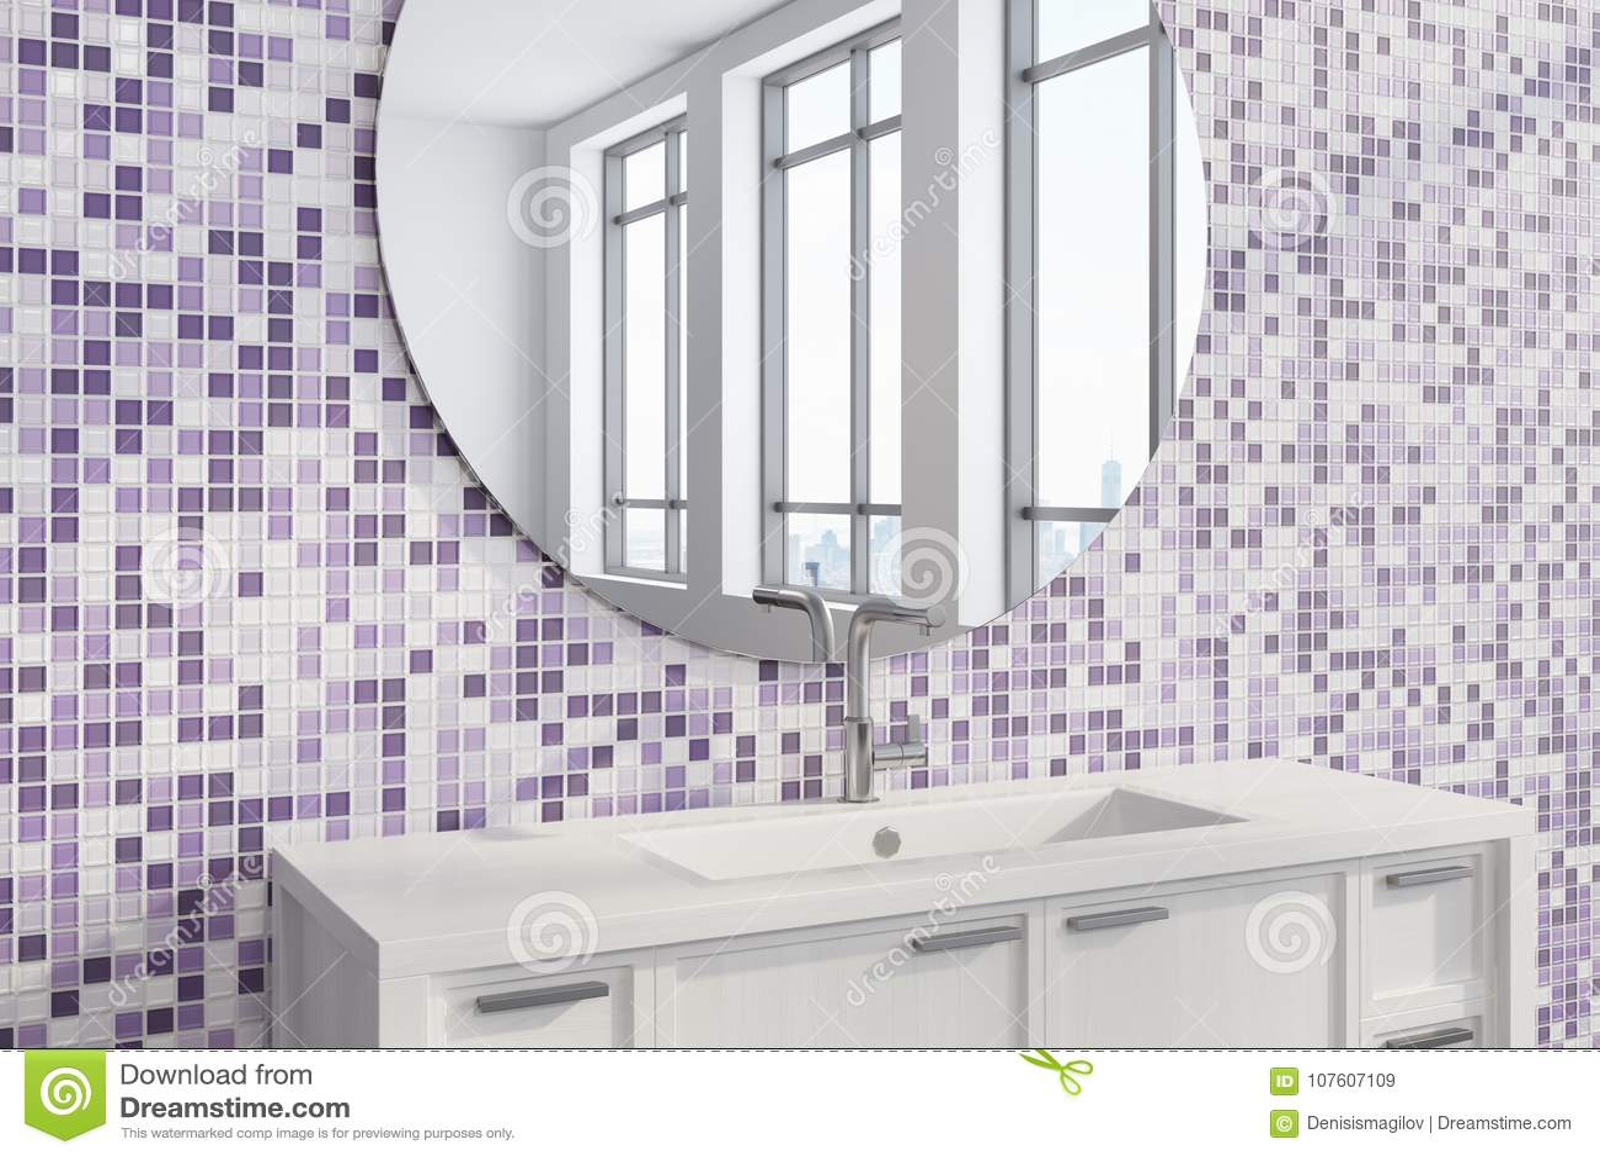 Purple Tile Bathroom Sink, Side Stock Illustration - Illustration of ...